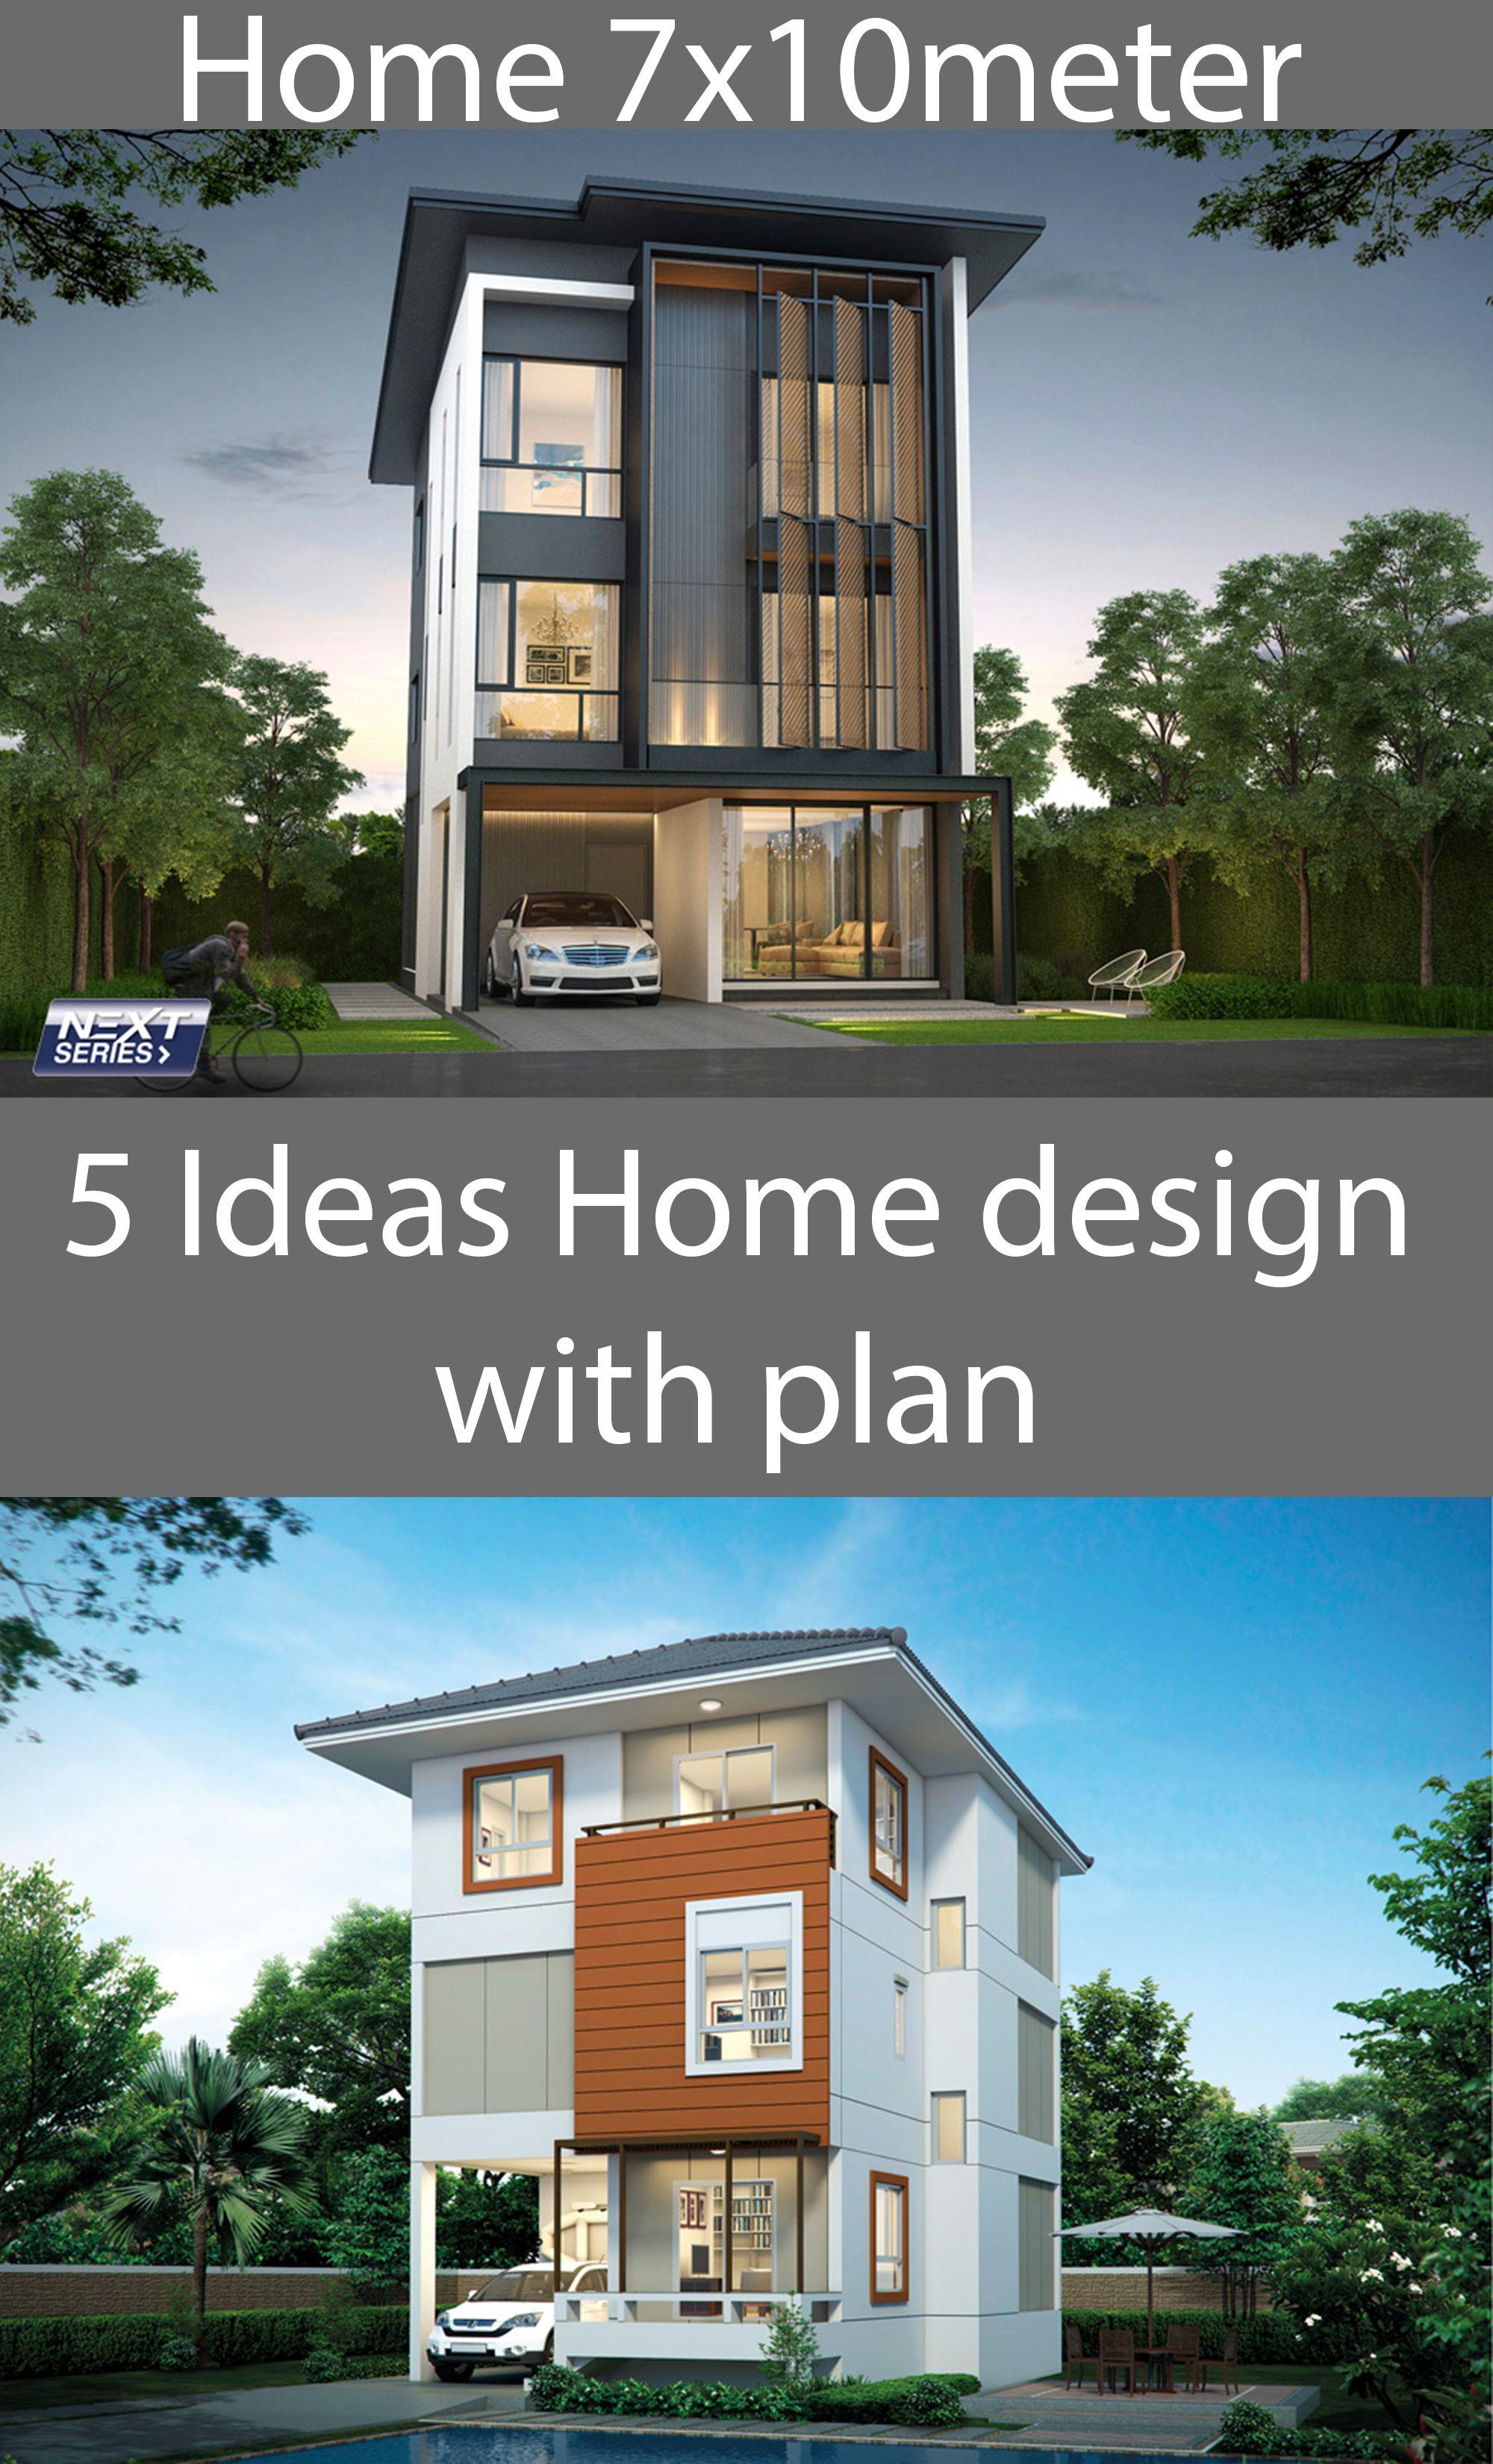 5 Ideas Home Design Plan 7x10m House Plan Map Home Design Plan Home Design Plans House Design